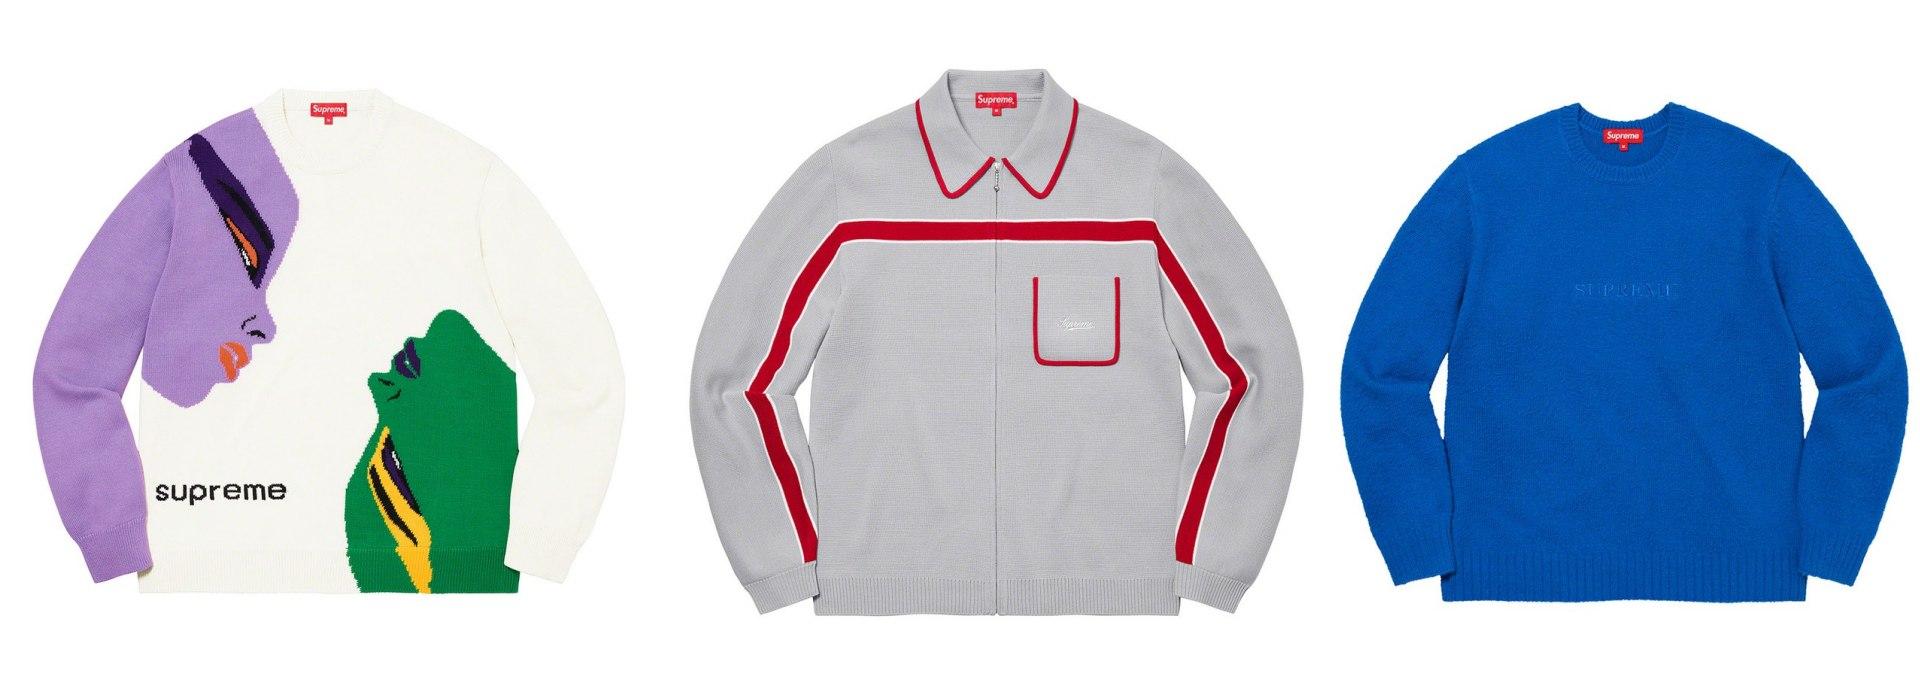 superme t shirt - Supreme 2021秋冬系列正式发布,是一如往常的复古风!